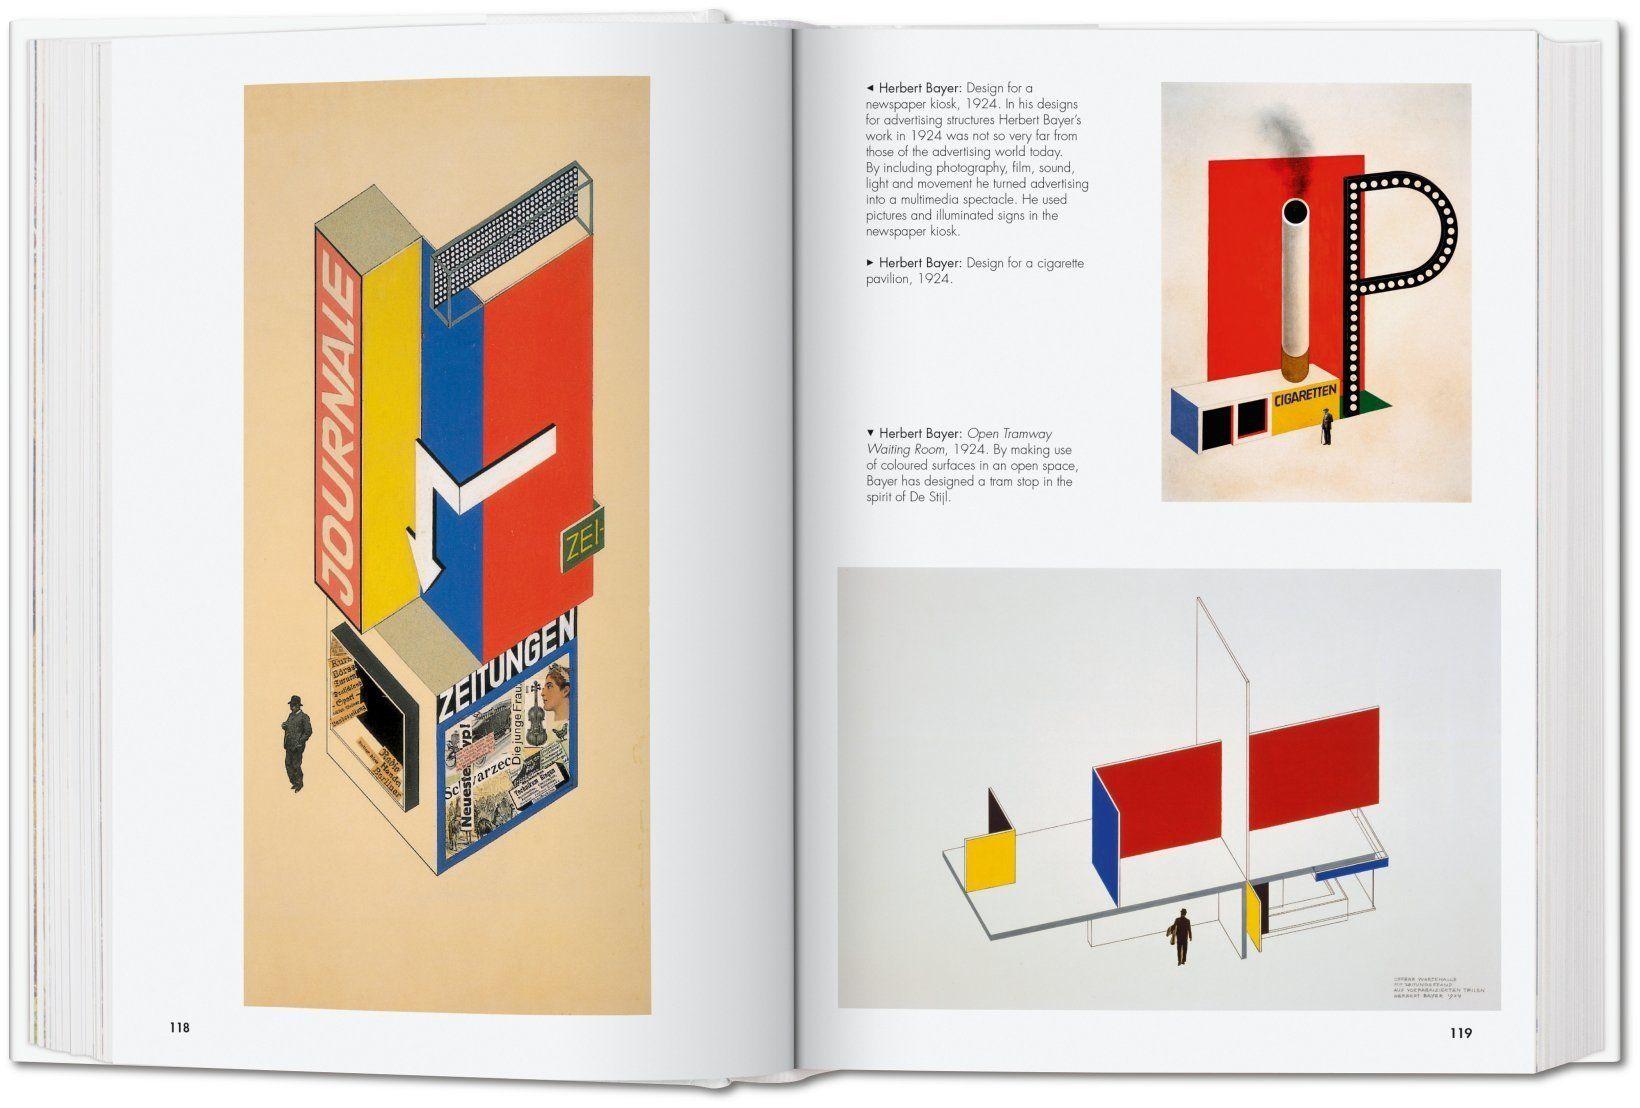 Bauhaus Updated Edition Study Art History Art School Bauhaus